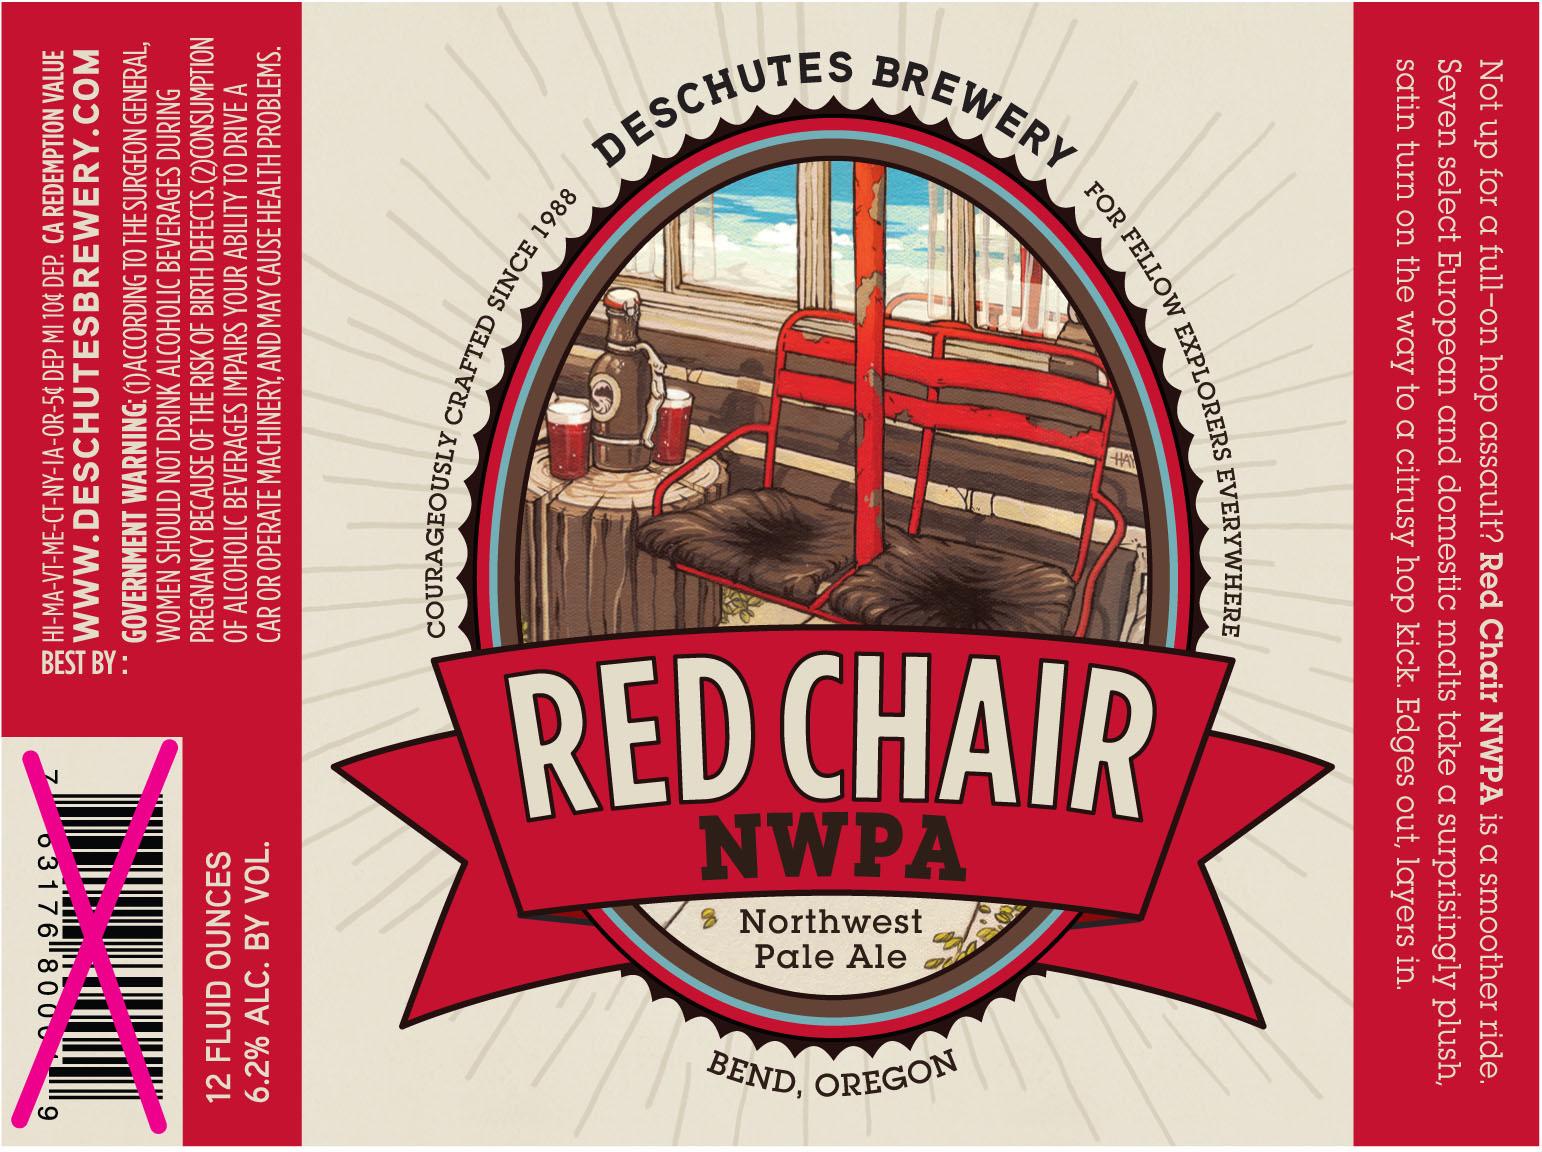 Deschutes's Red Chair NWPA